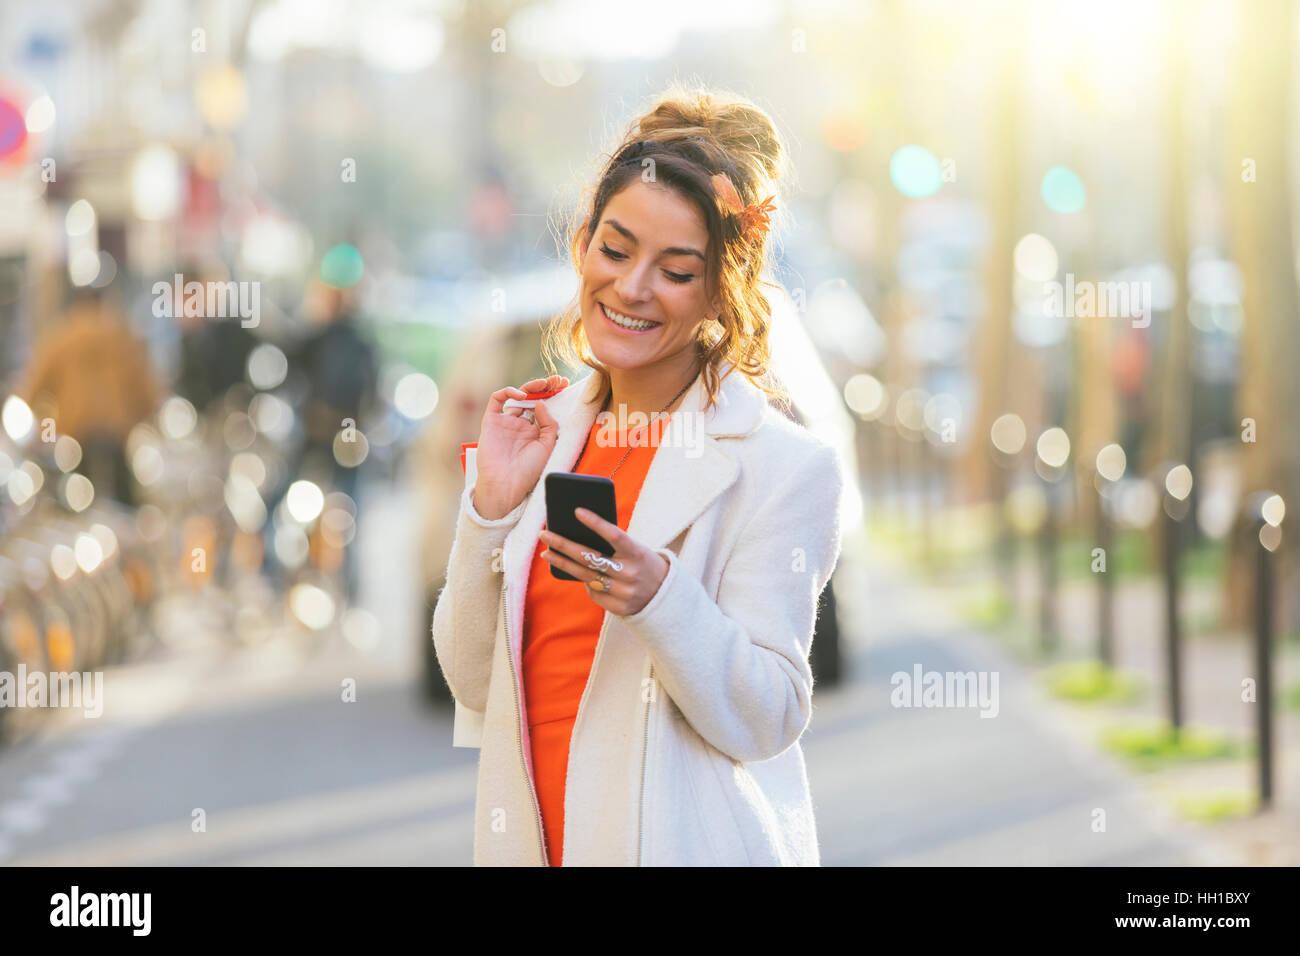 Paris, Woman using smart phone in street - Stock Image